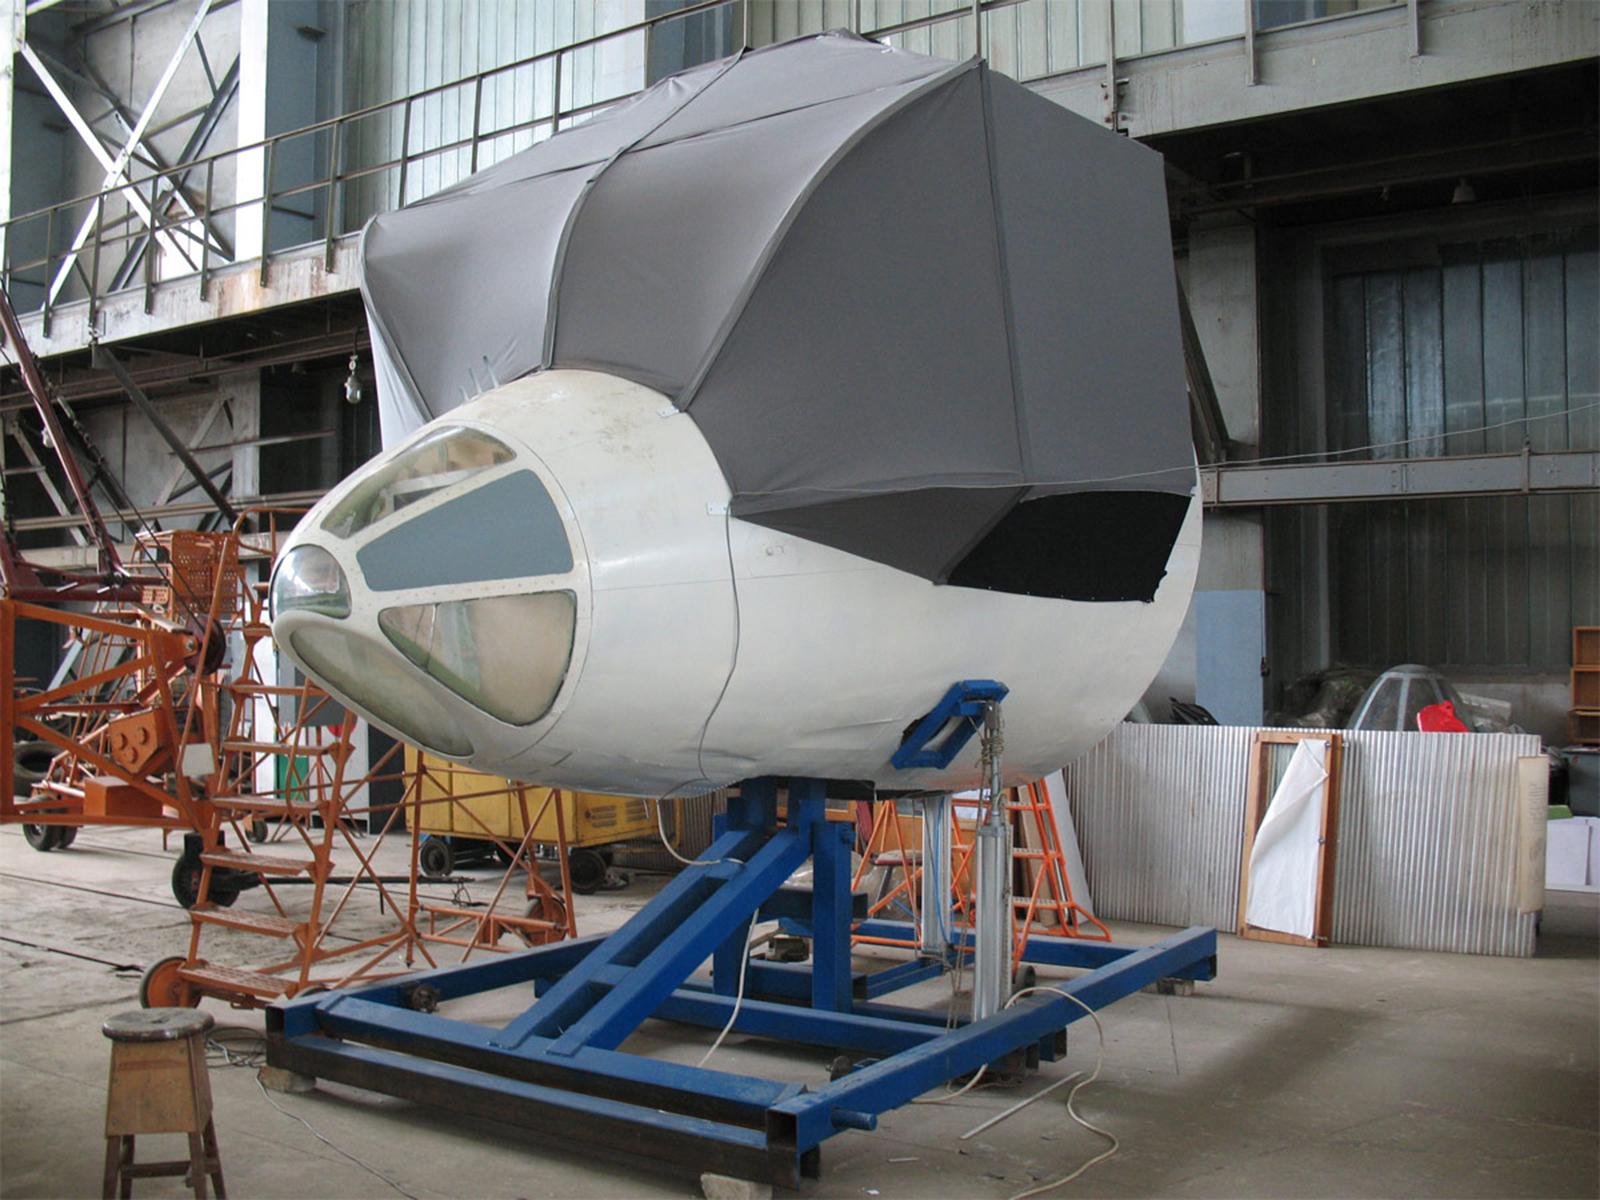 Tupolev Tu-134 flight and navigation training device history